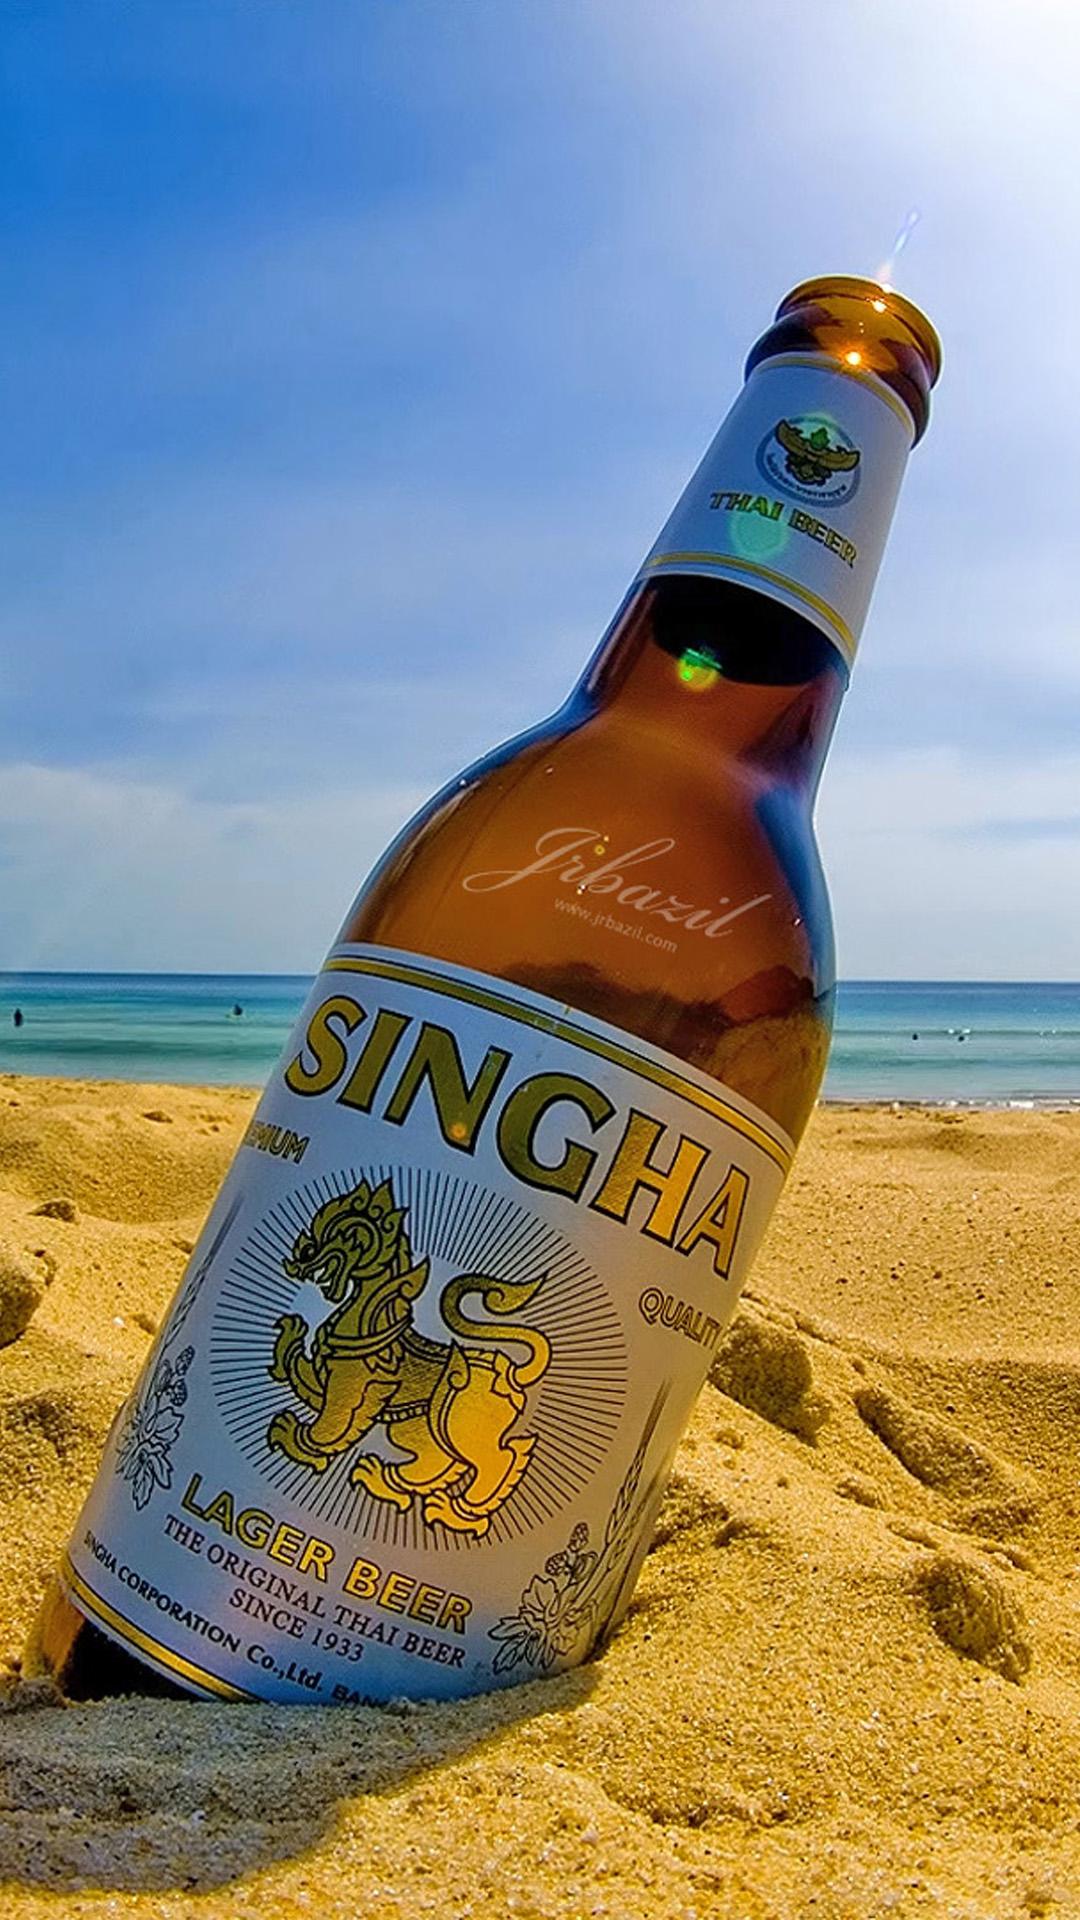 Summer Beach Beer Bottle Wallpapers For Iphone